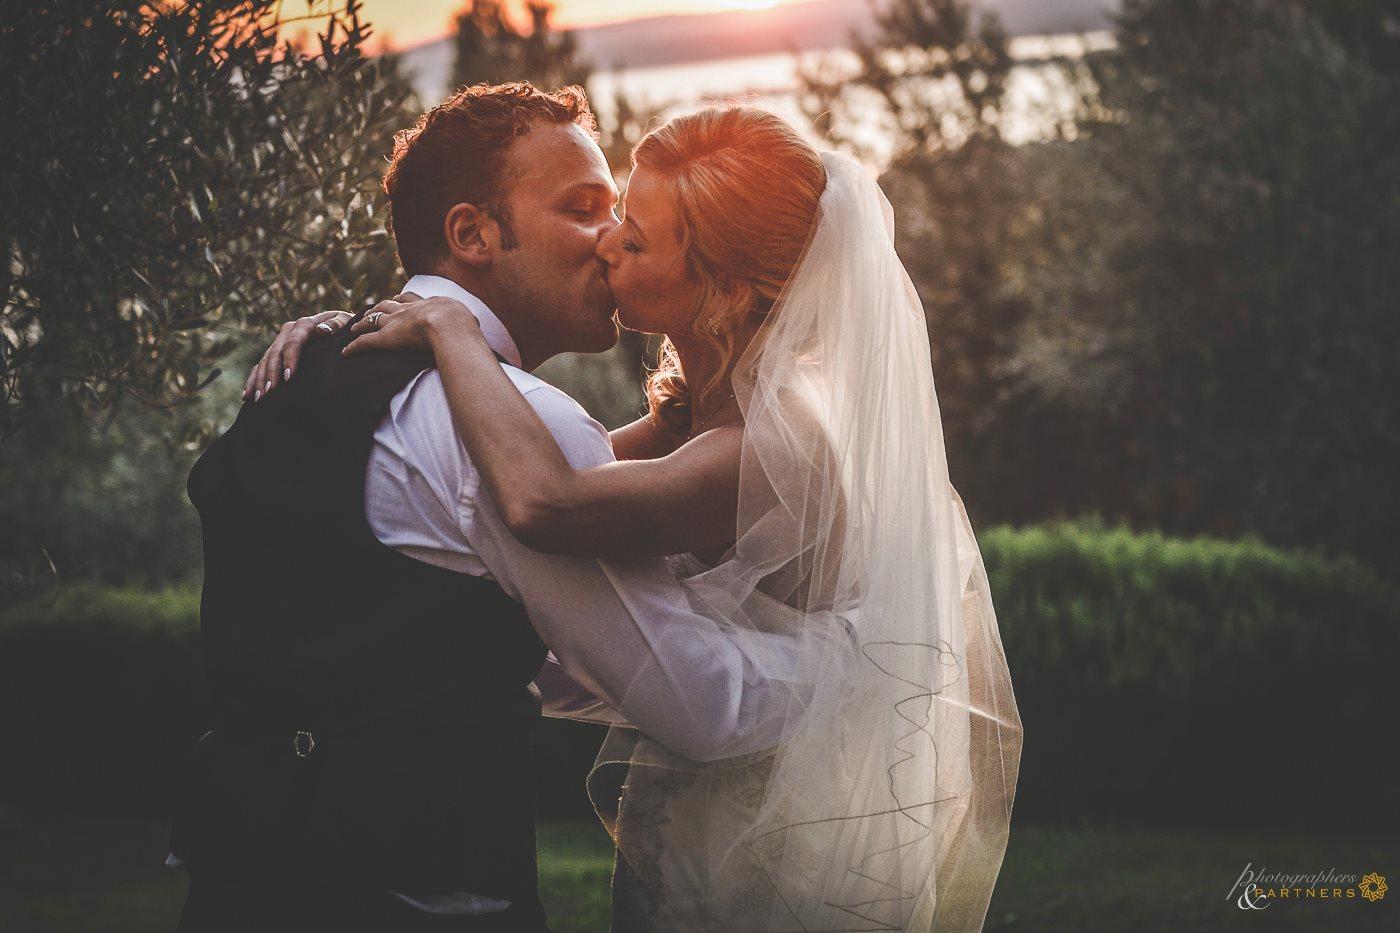 wedding_photography_cortona_19.jpg